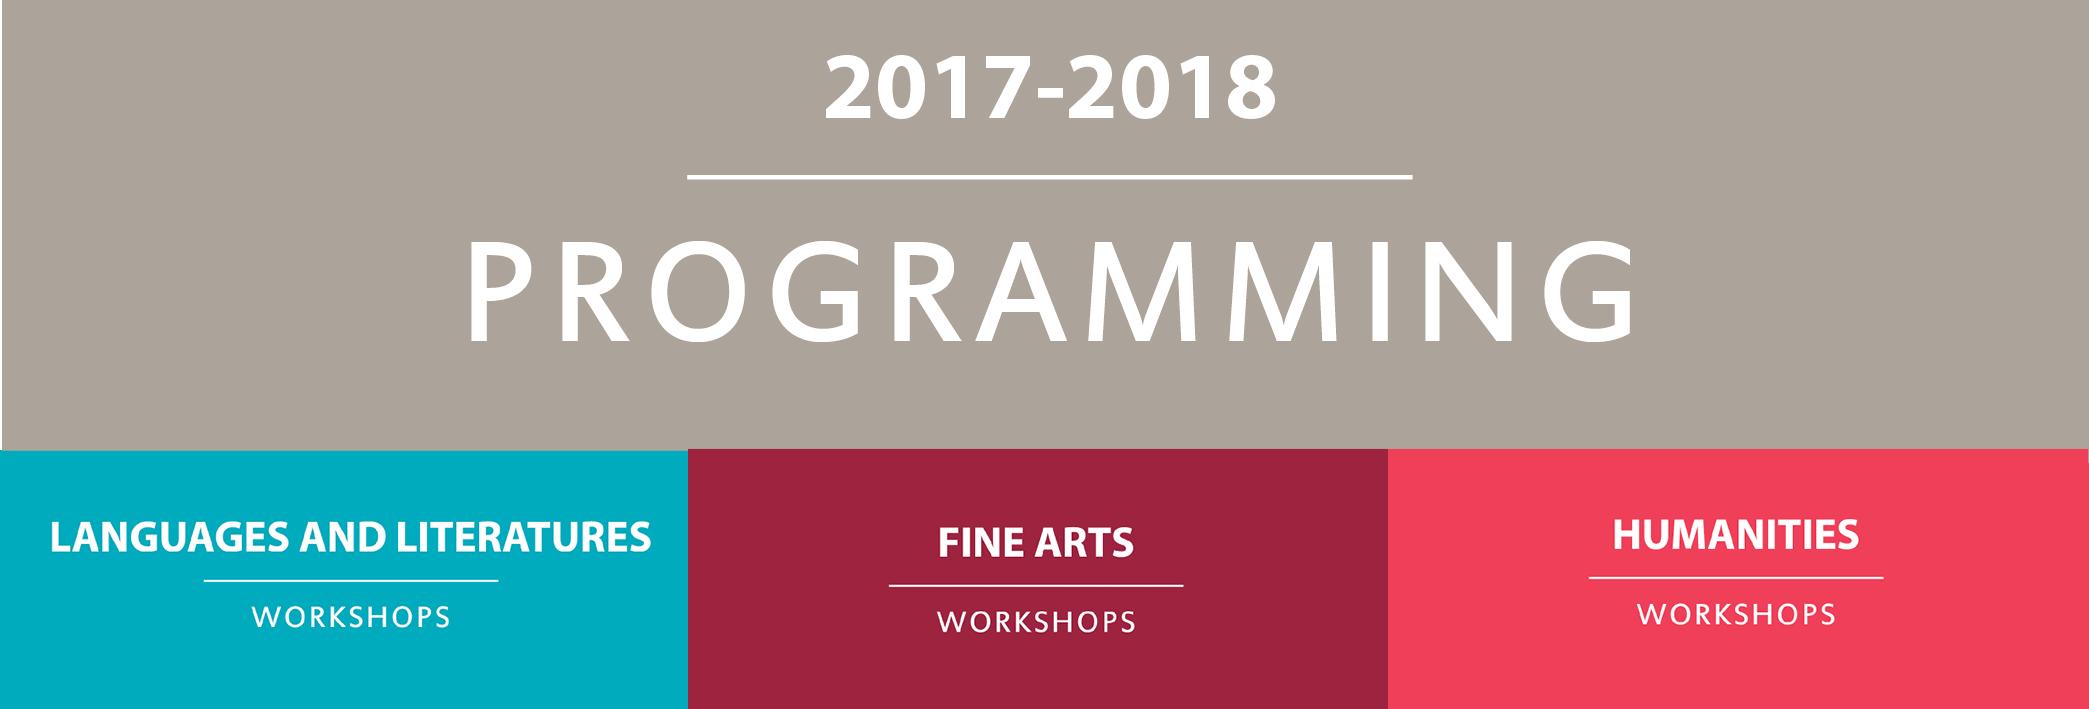 Professor-Ambassadors Program Programming